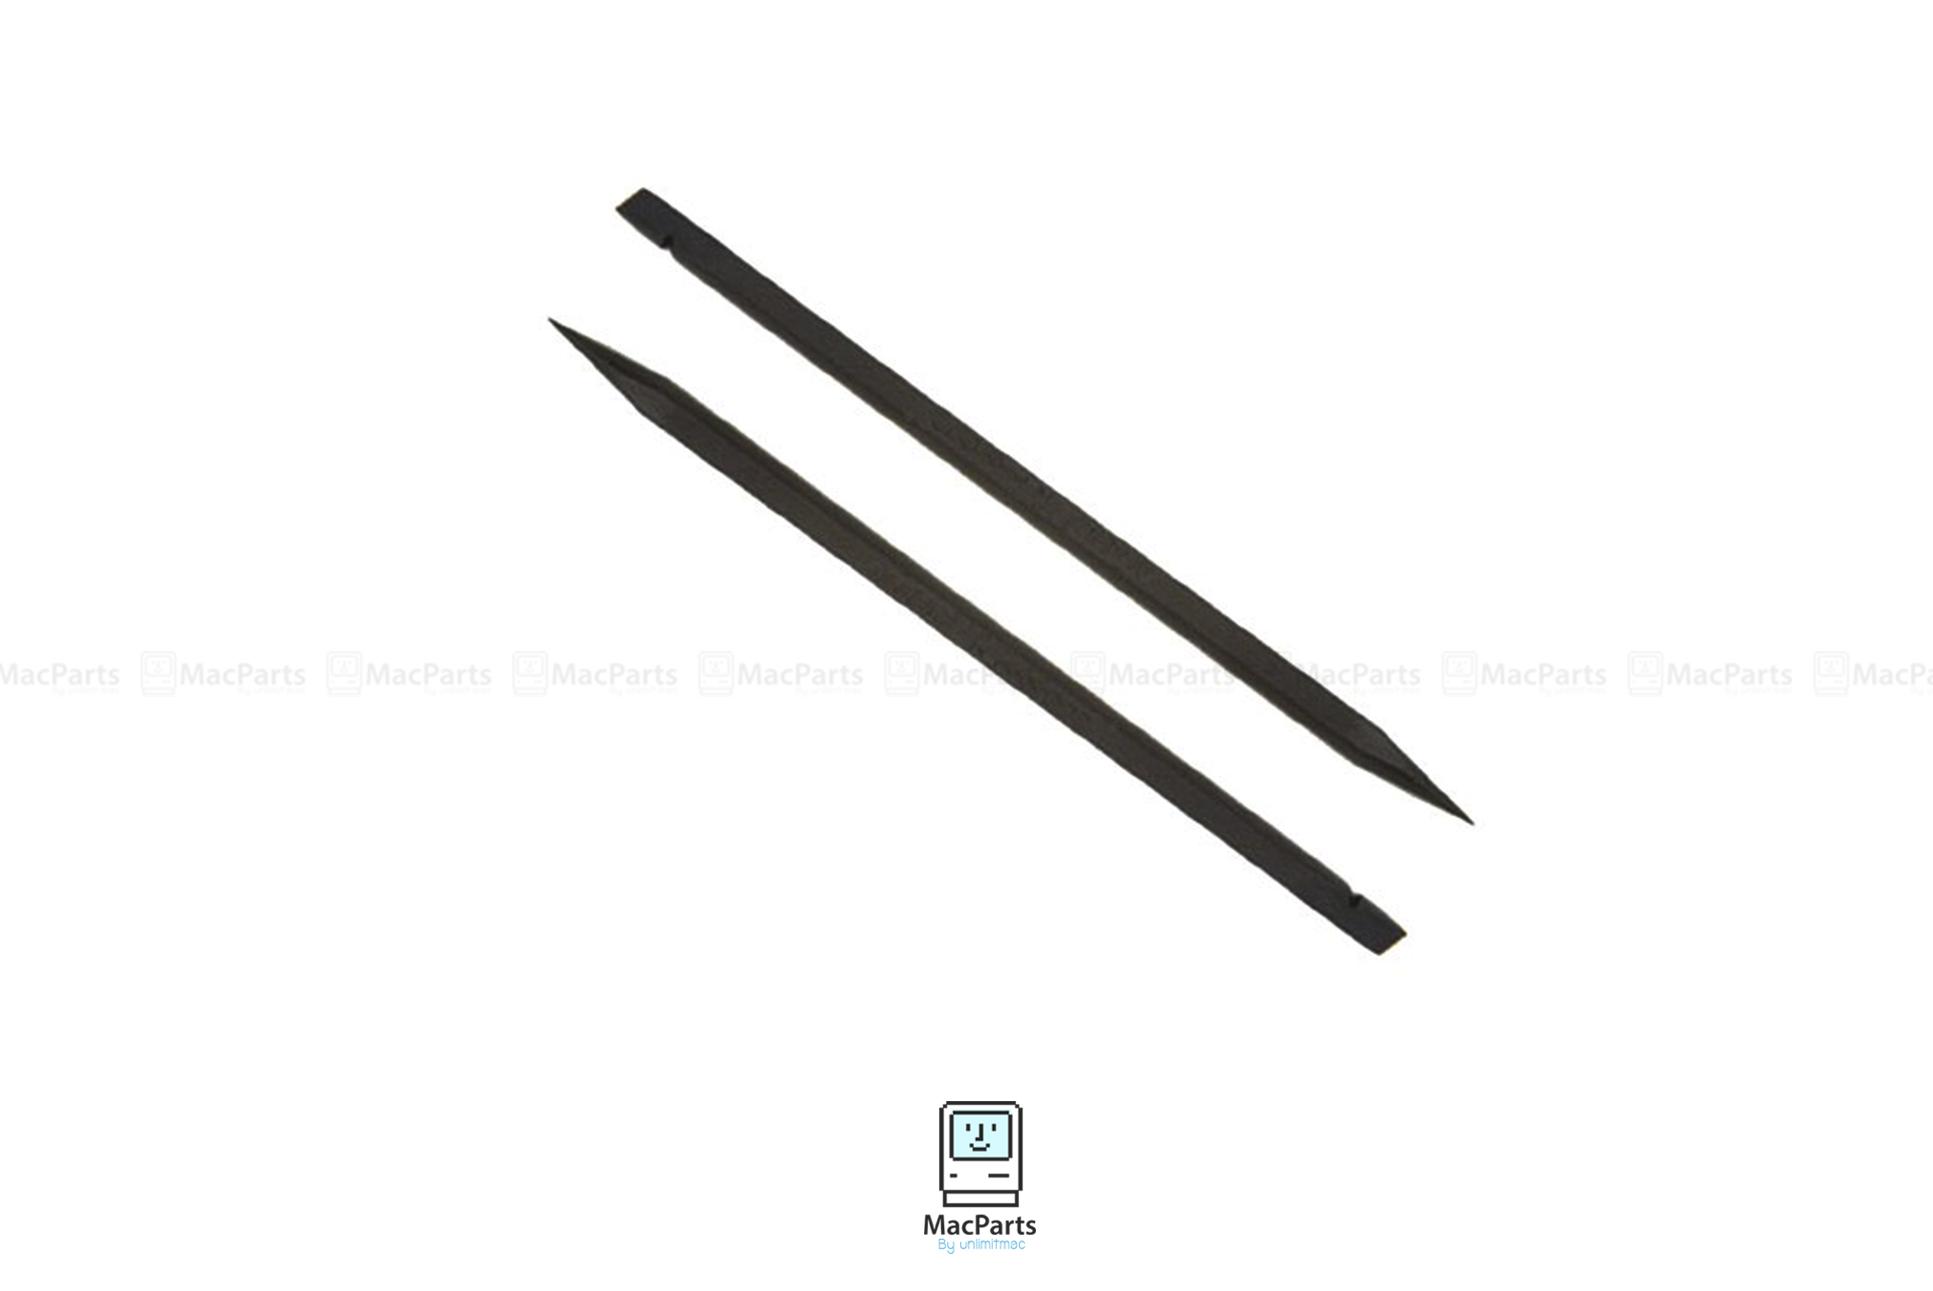 922-5065 Nylon Probe Tool Black Stick (X2ชิ้น)